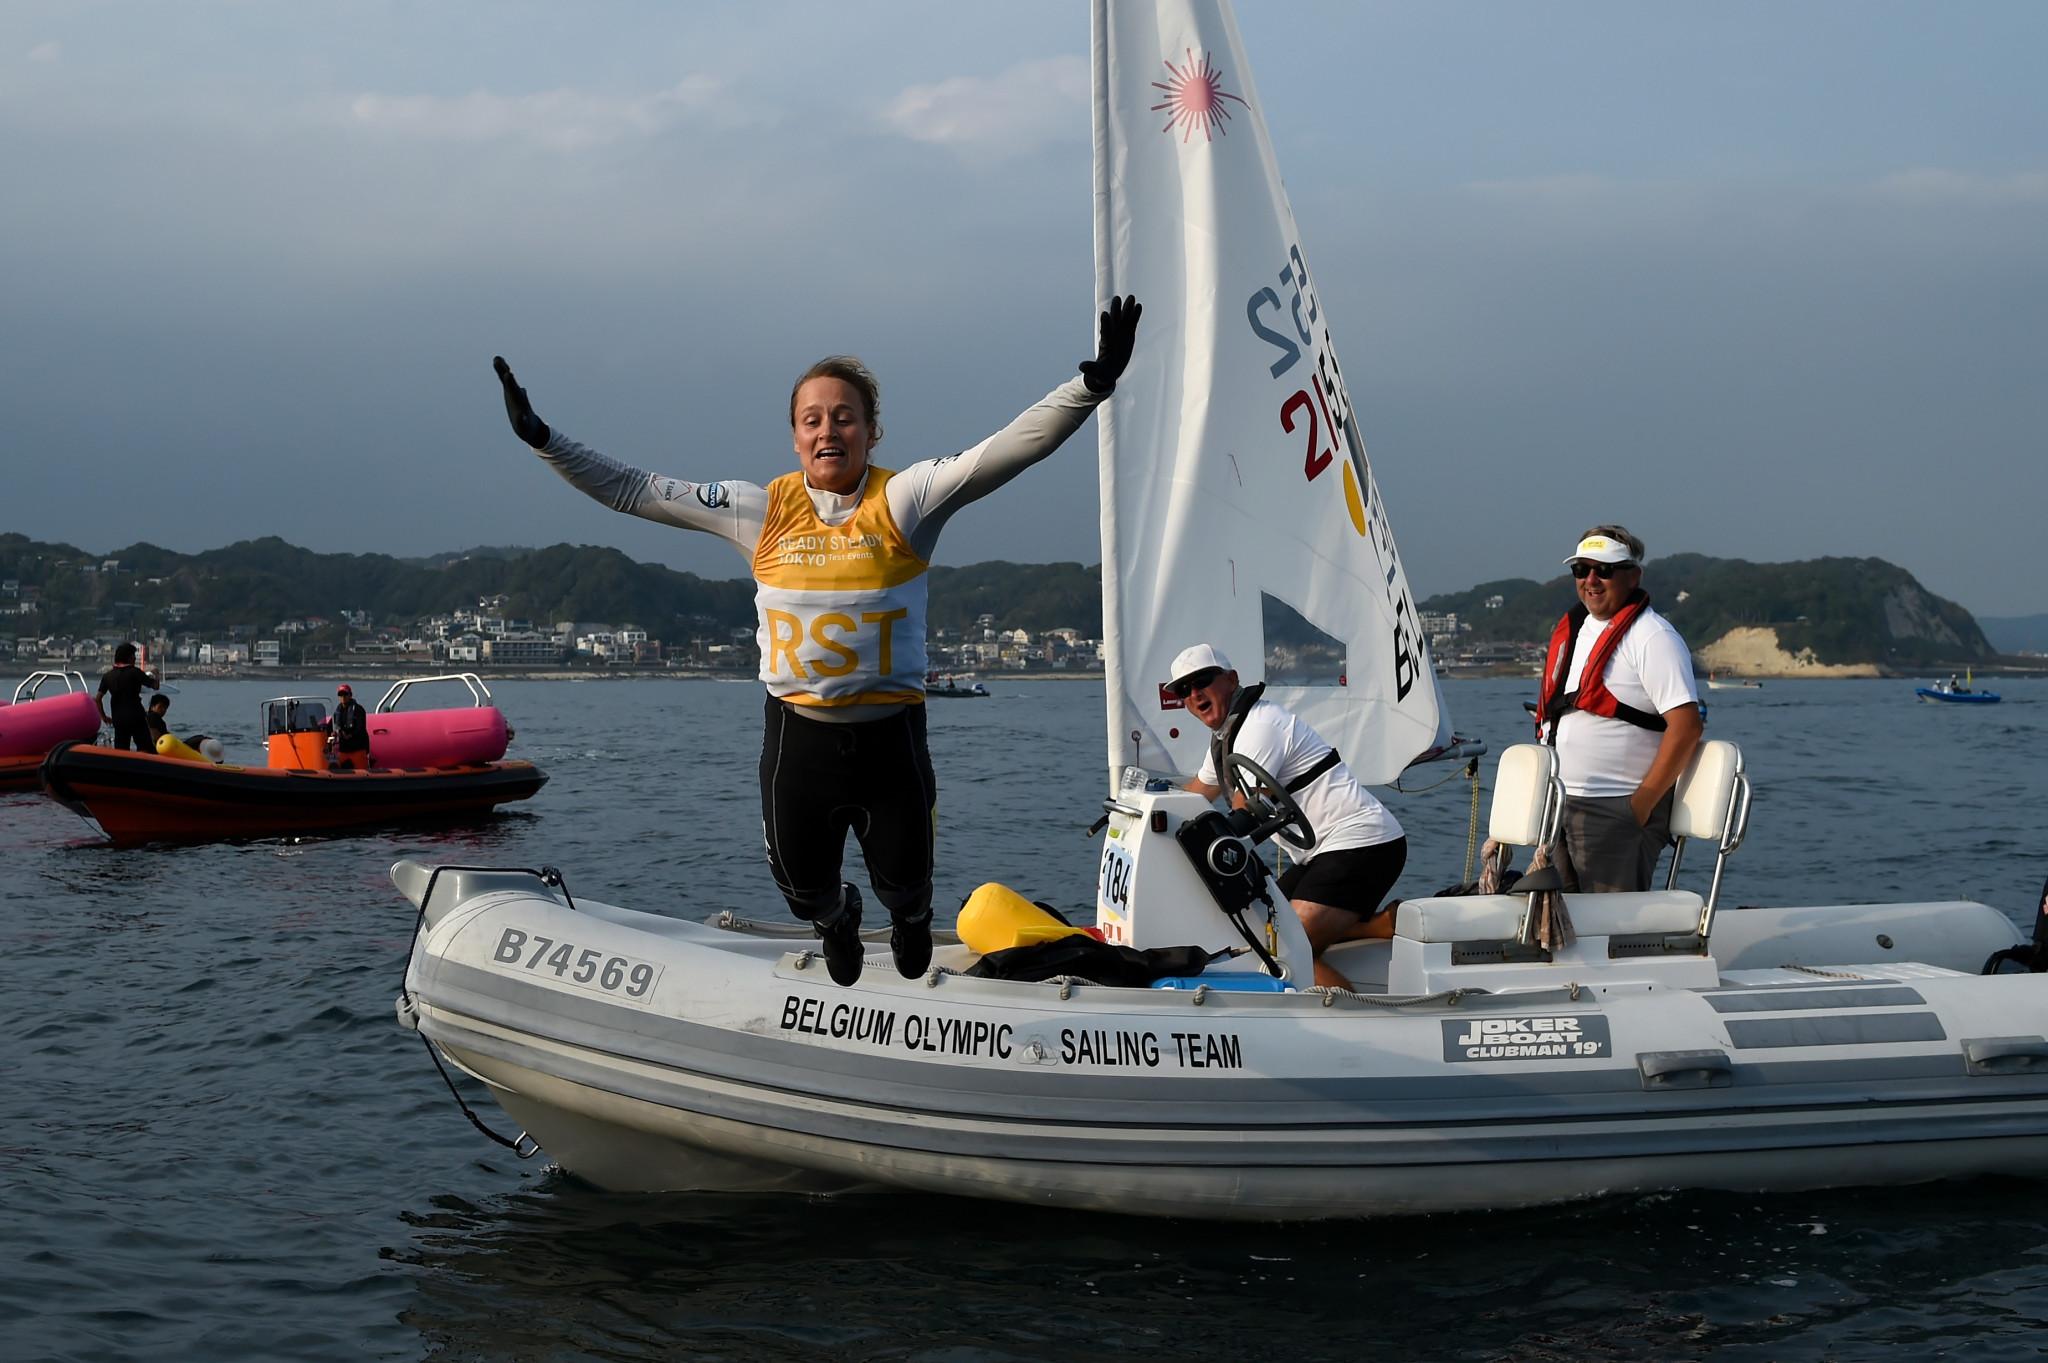 Belgium's laser radial sailor Emma Plasschaert  is among other test event winners in action ©Getty Images